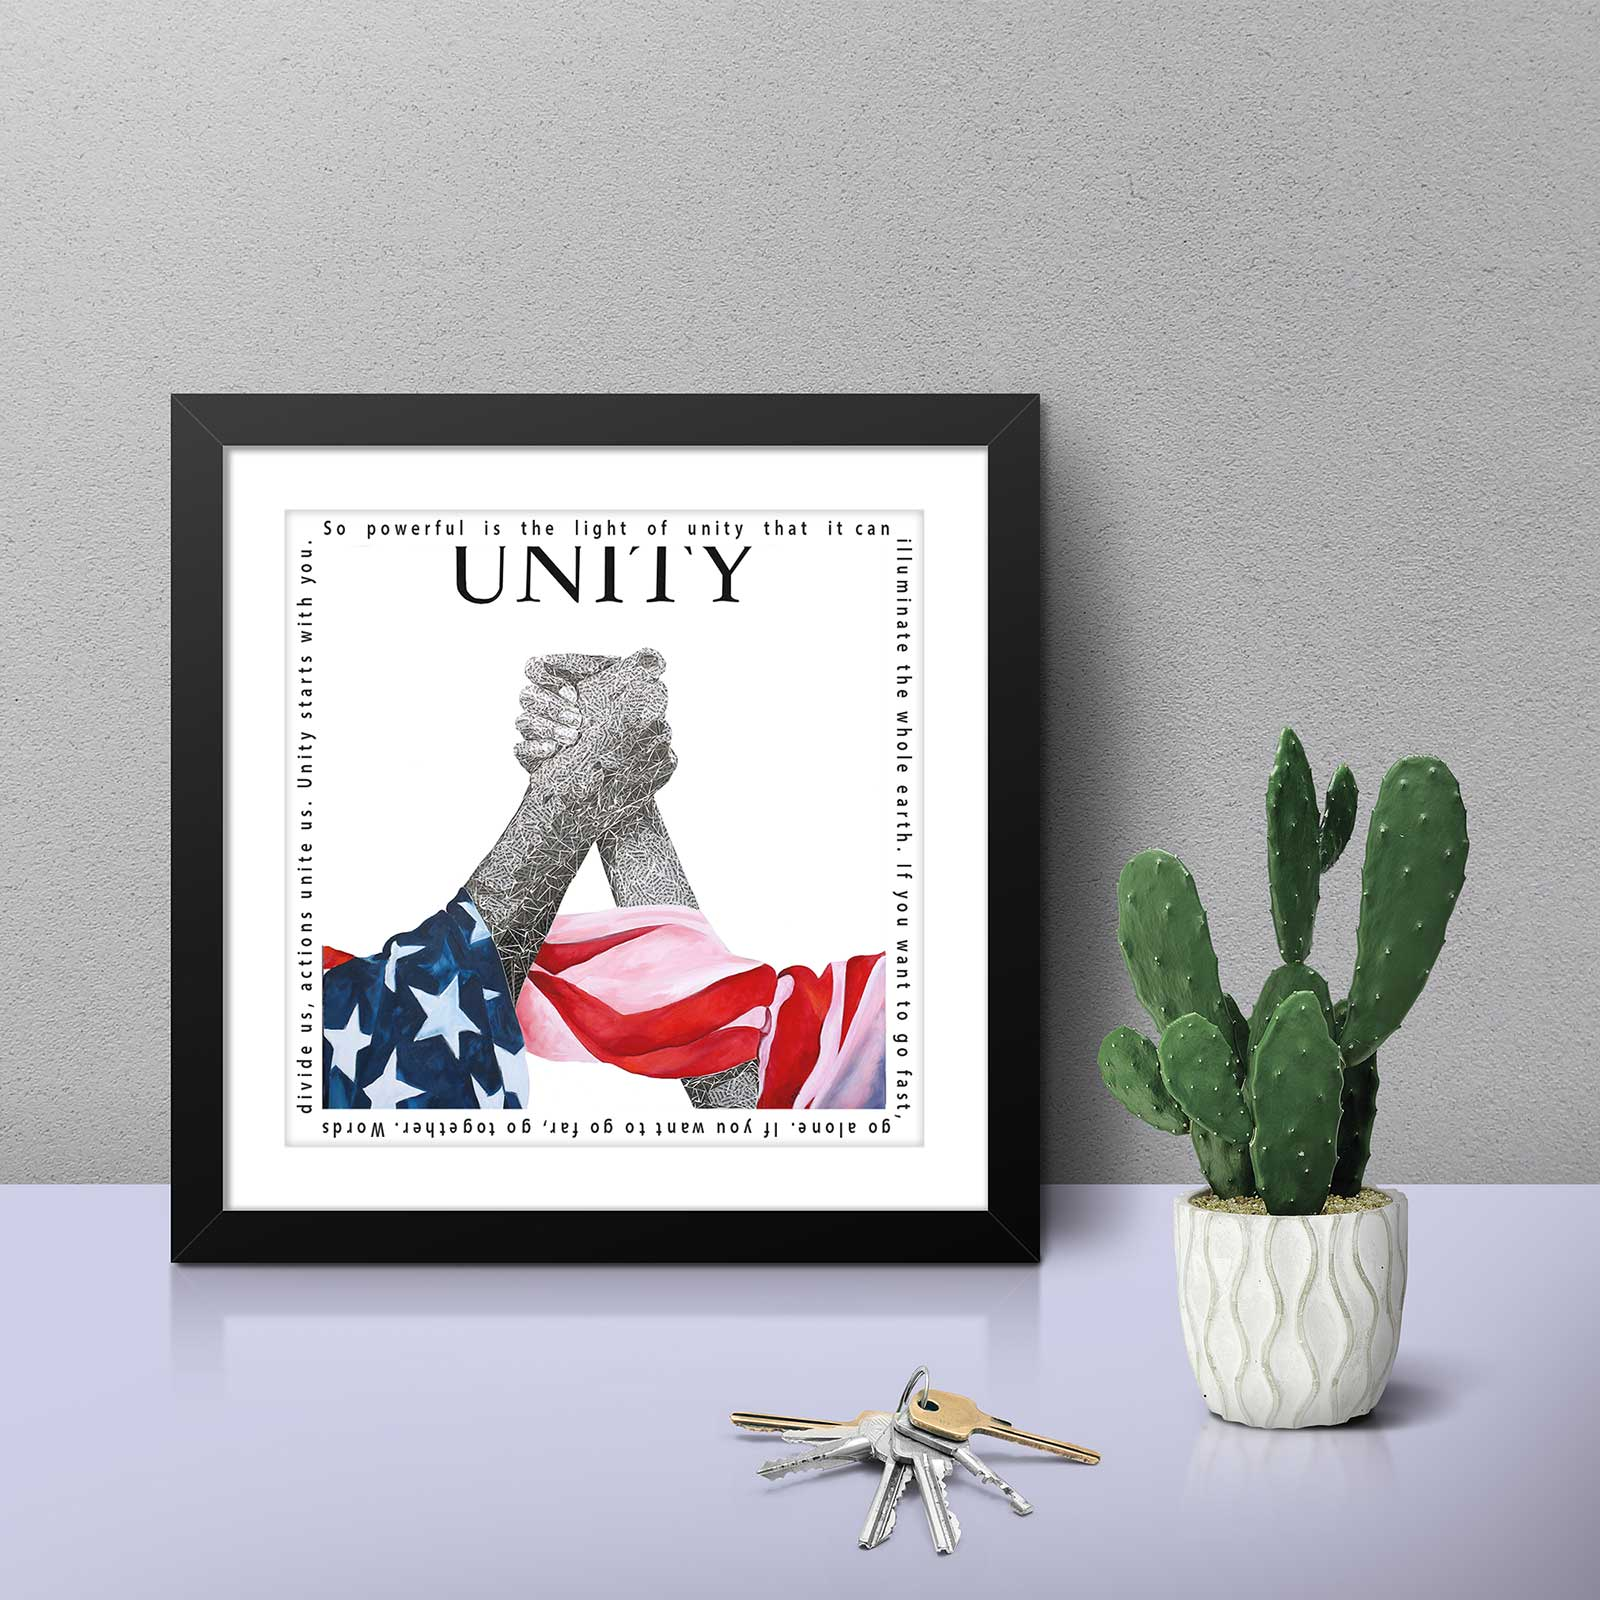 Gicleé Print of Unity